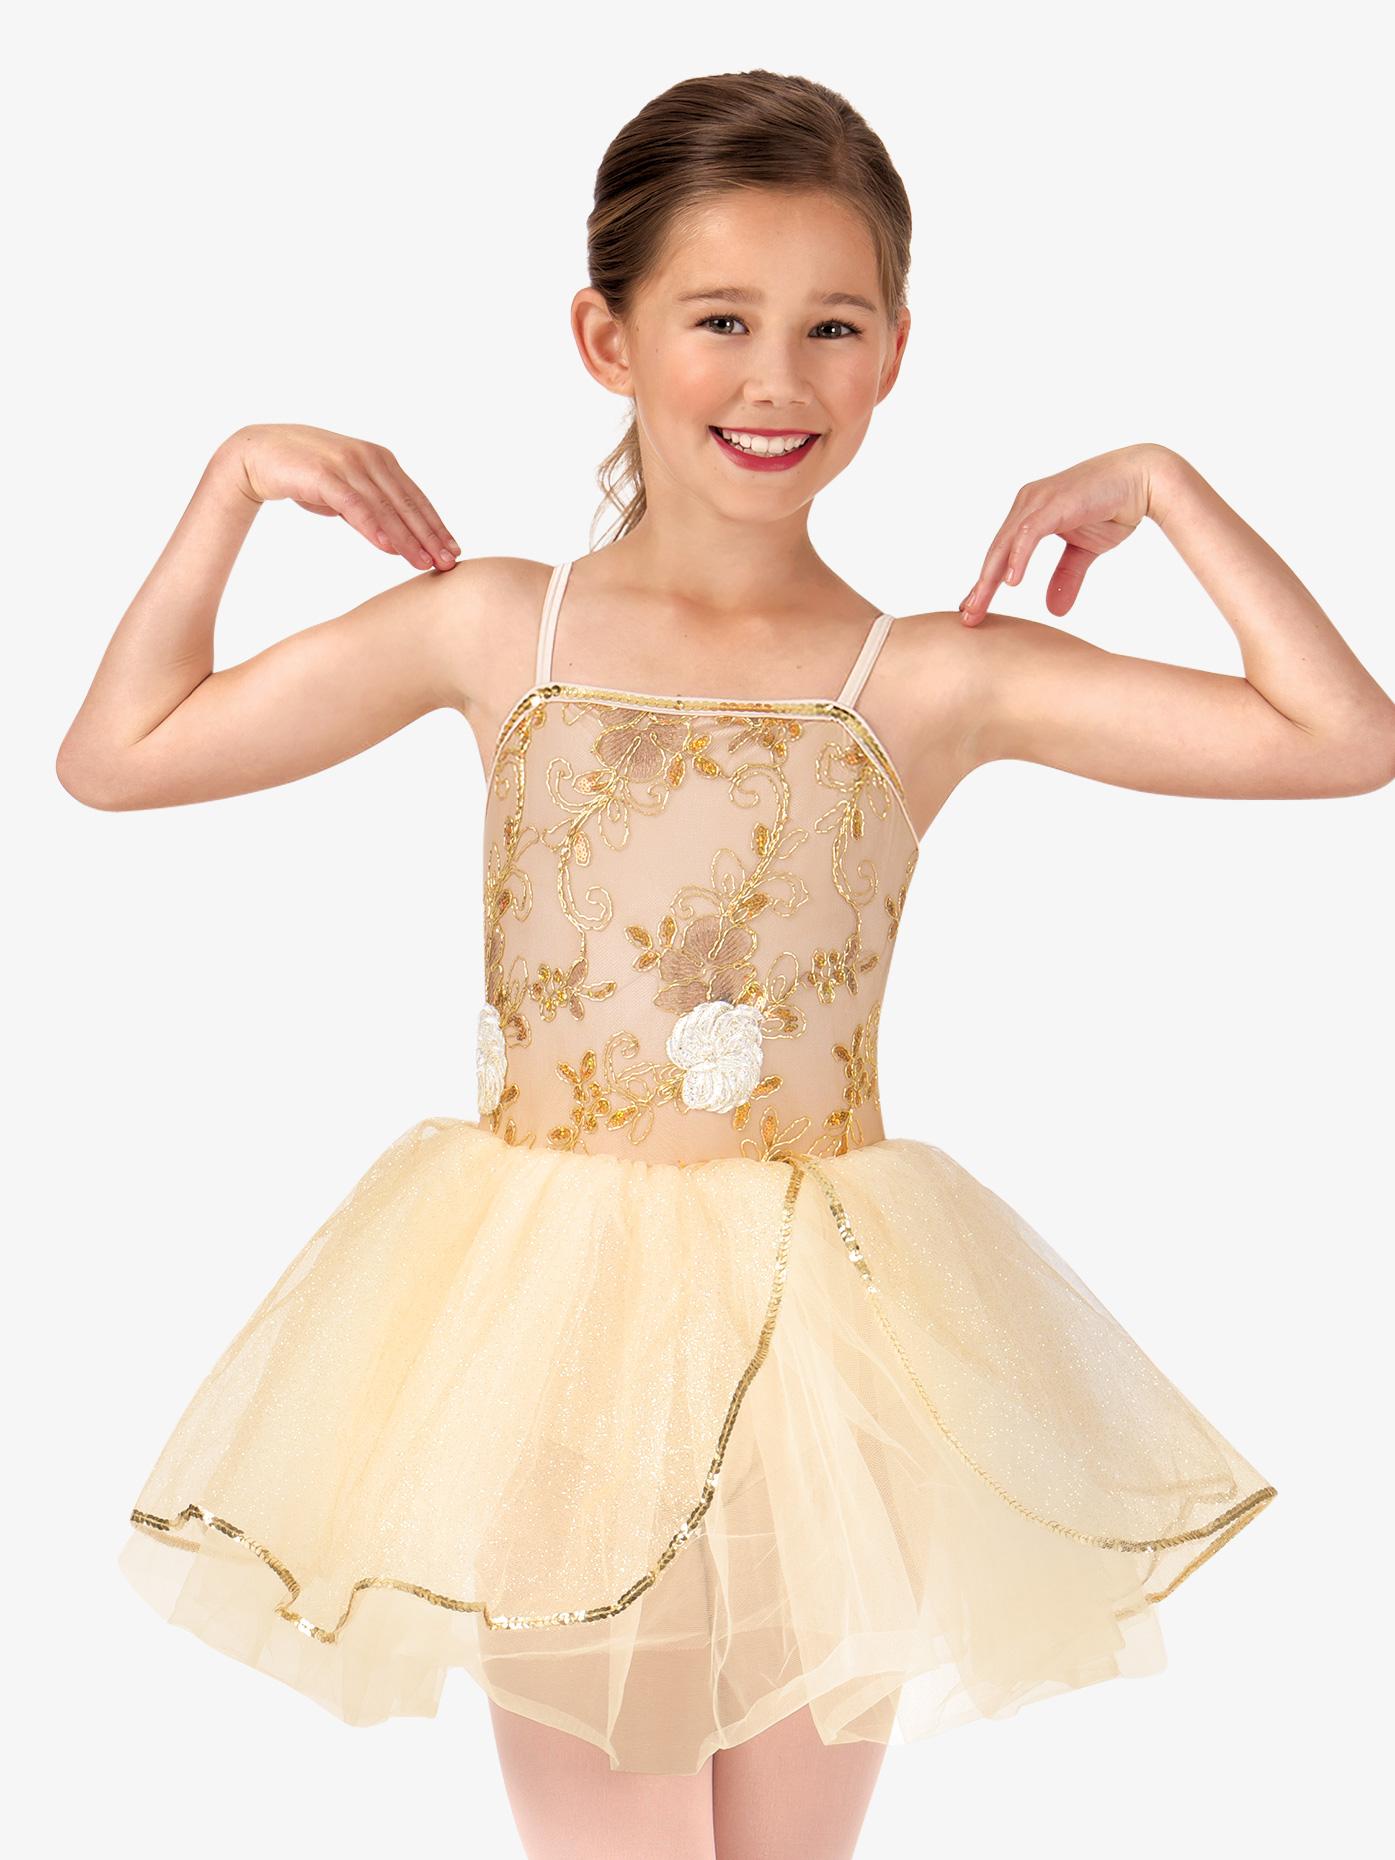 La Petite Ballerina Child Beaded Flower Camisole Tutu Costume Dress PB2013C